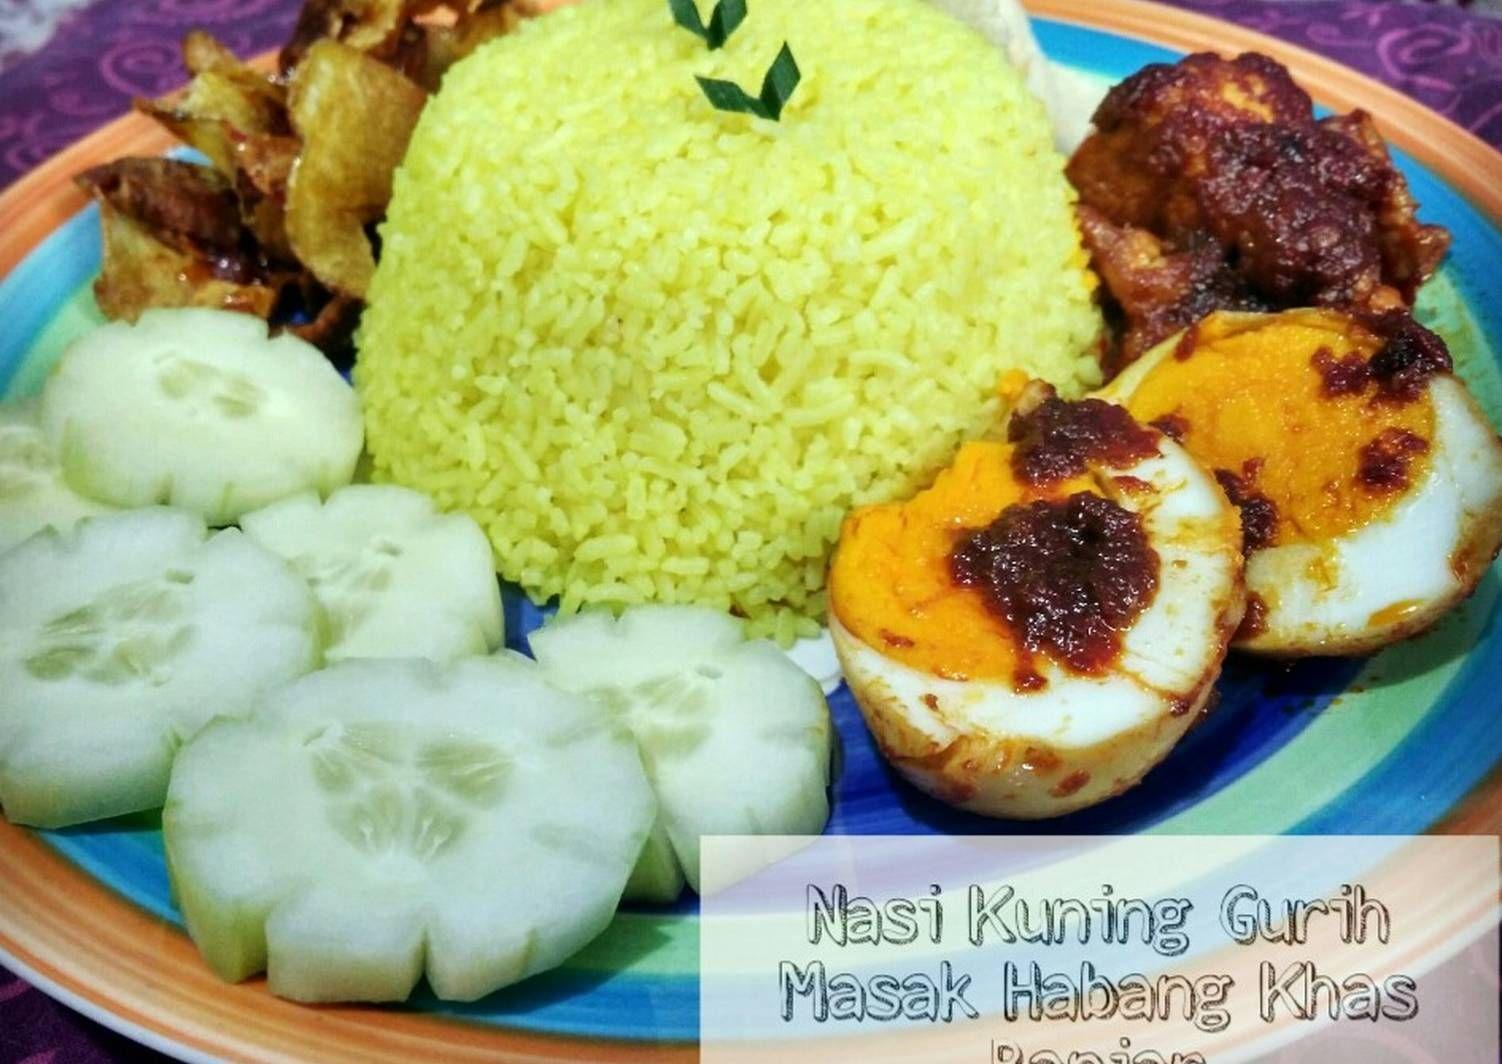 Buras Banjar With Bumbu Masak Habang Best In The World Kalimantan Selatan Indonesia Resep Makanan Makanan Resep